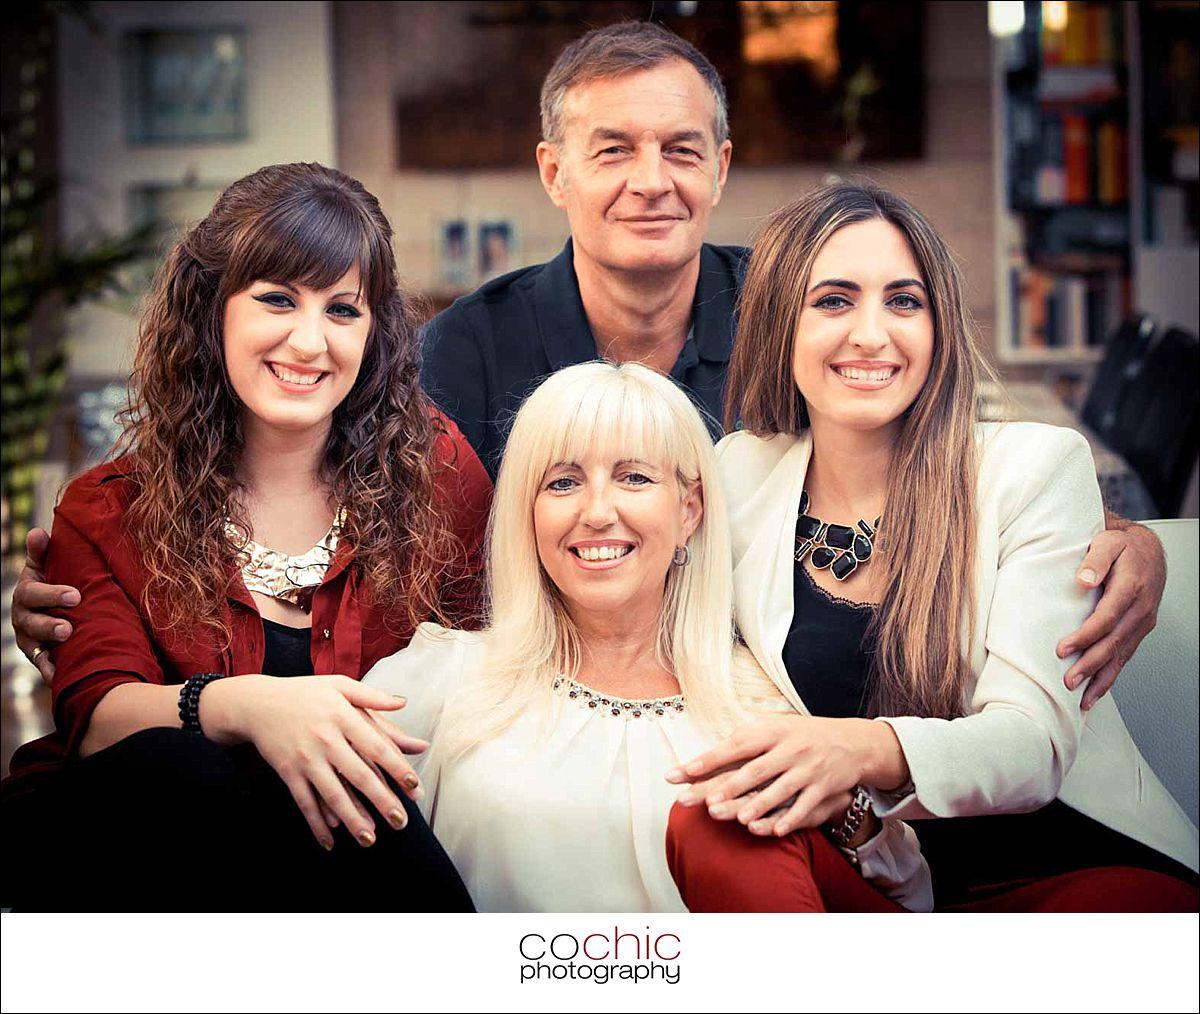 12-fotograf wien familienfotos wohnung indoor familie porträt fotoshooting-20120916-_KO_0285